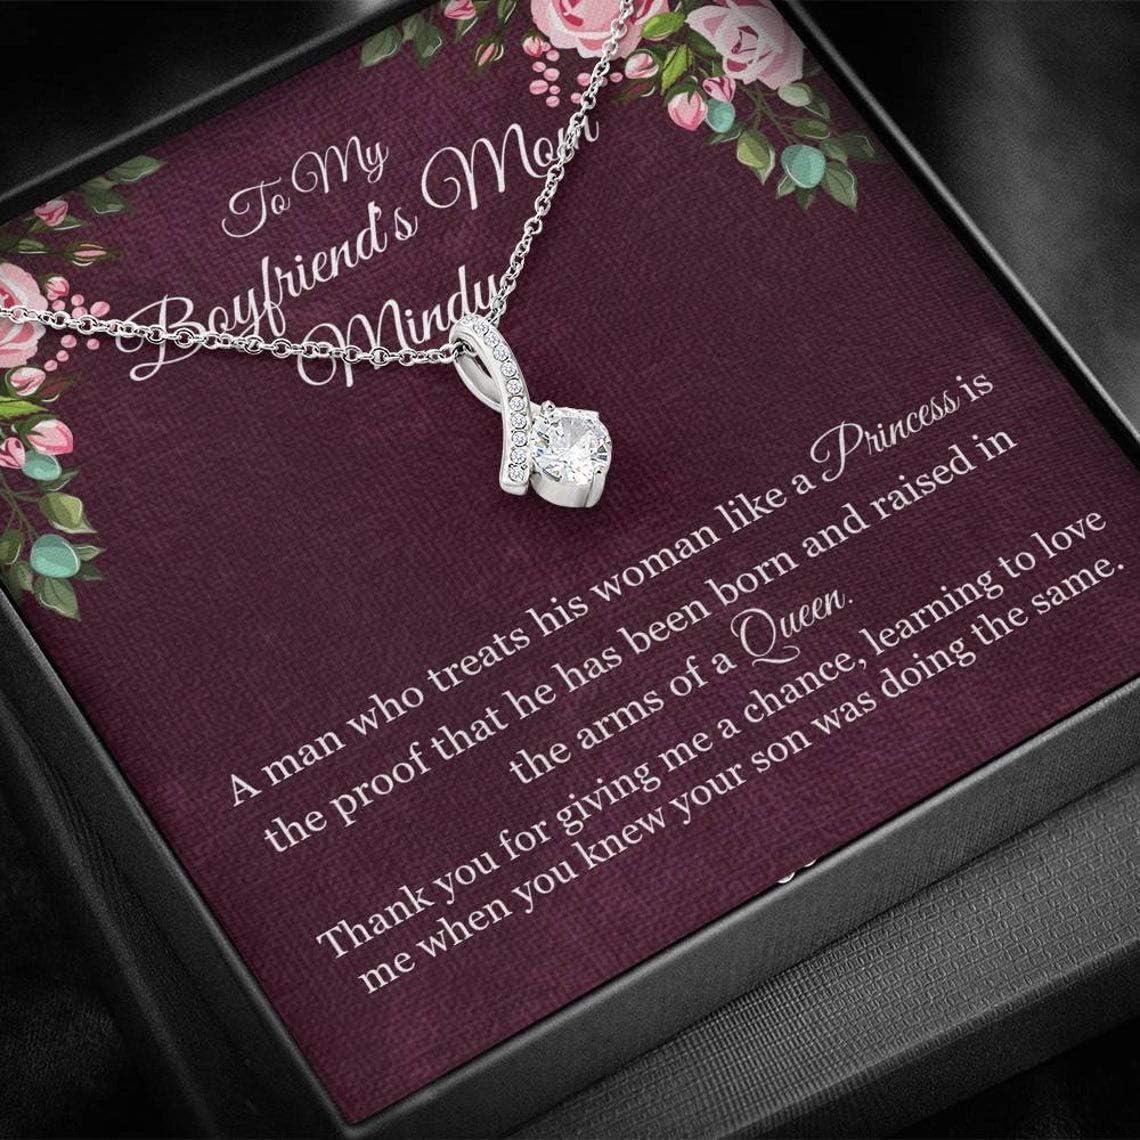 Boyfriends Mom Gift Boyfriend's Mother 新品 送料無料 Birthday 人気ブランド多数対象 Boyfr for